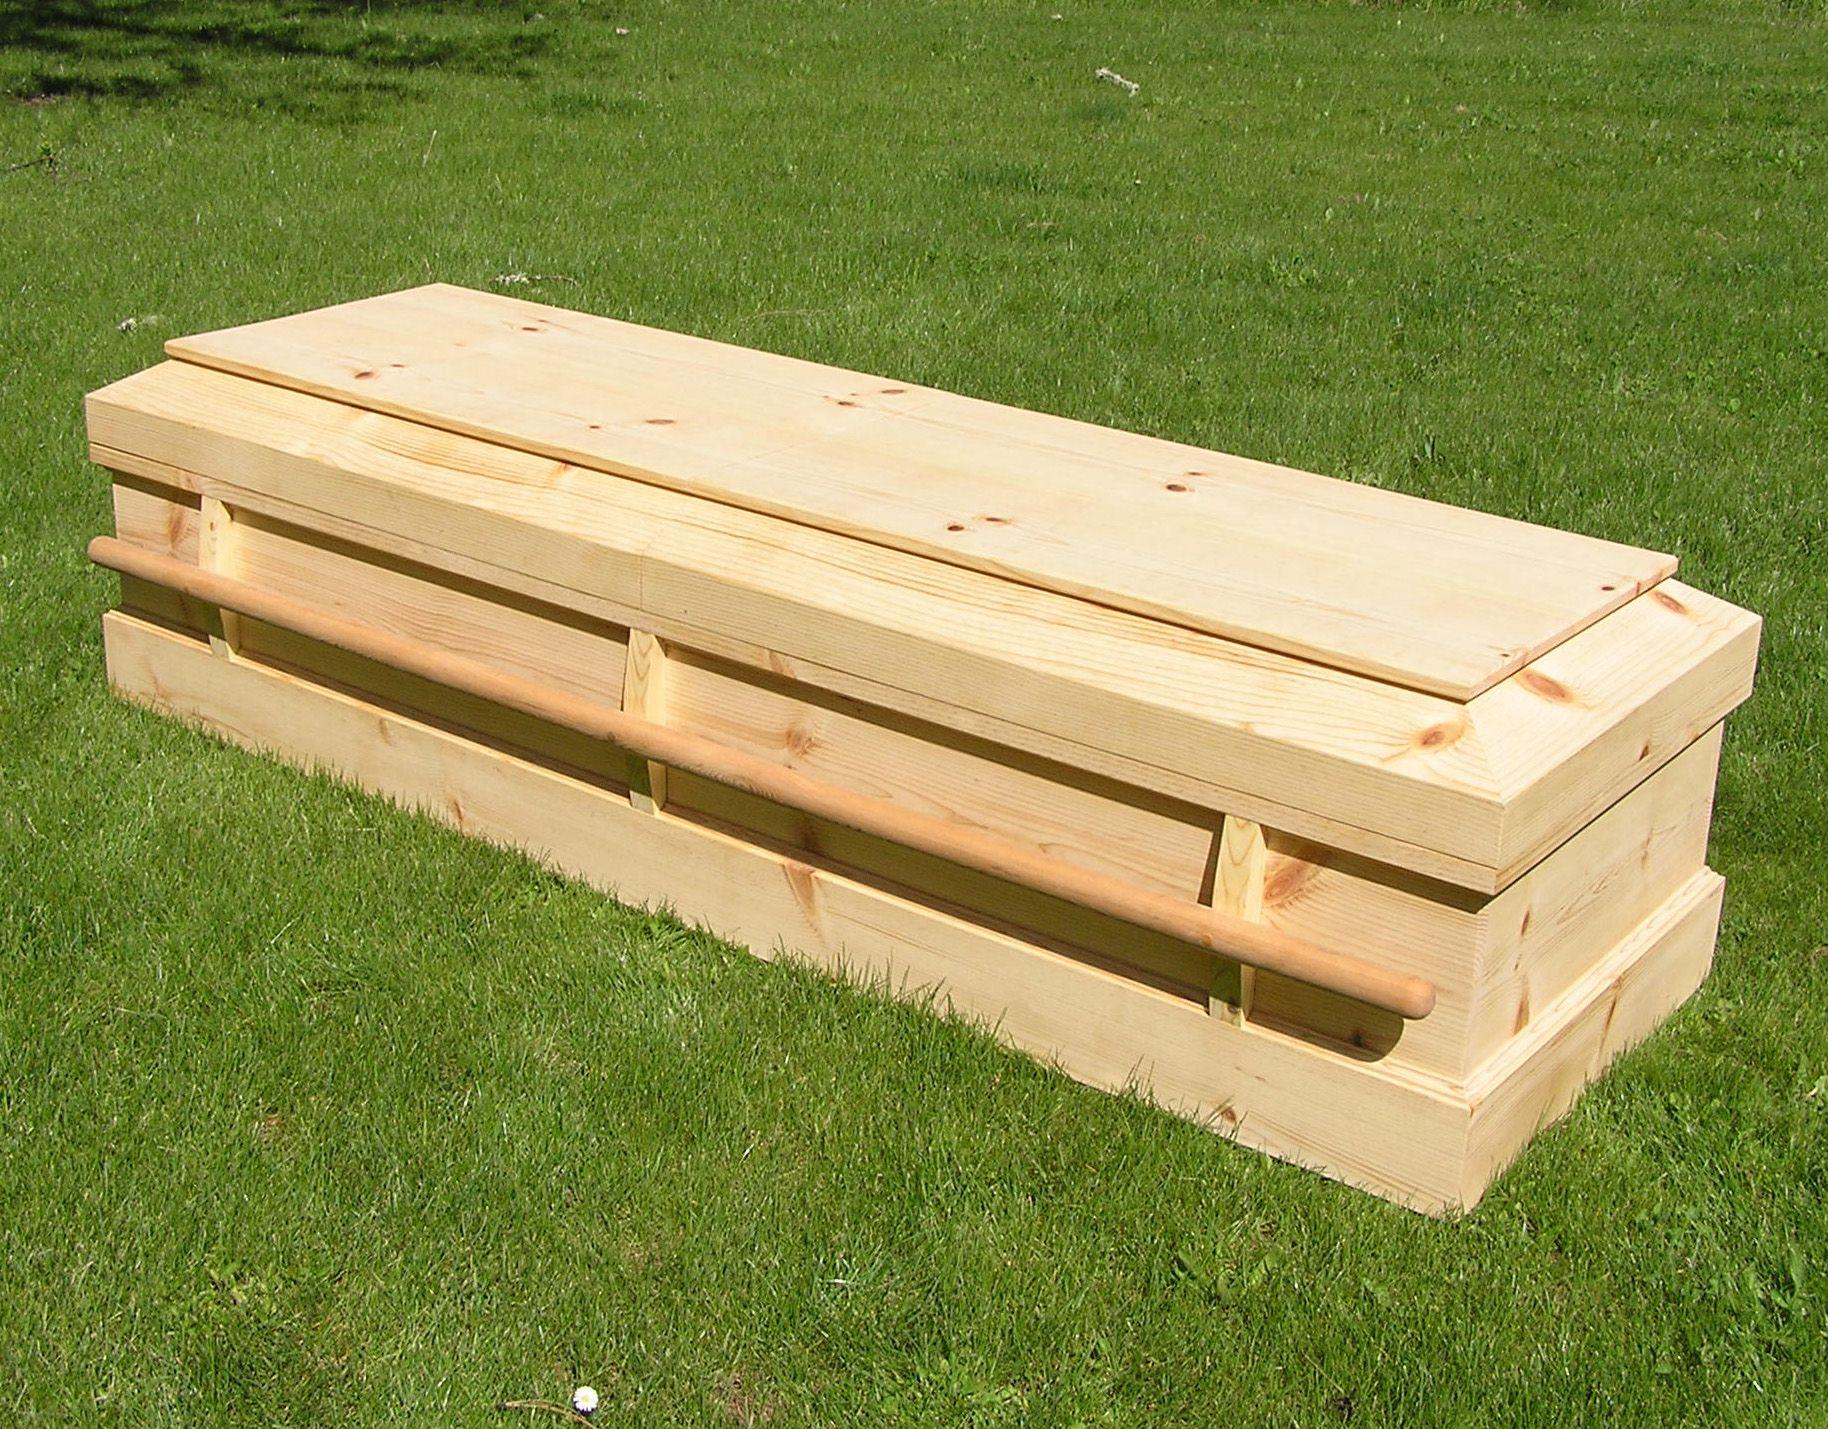 Wooden casket earth friendly caskets cremation urns and shrouds wooden casket earth friendly caskets cremation urns and shrouds solutioingenieria Images